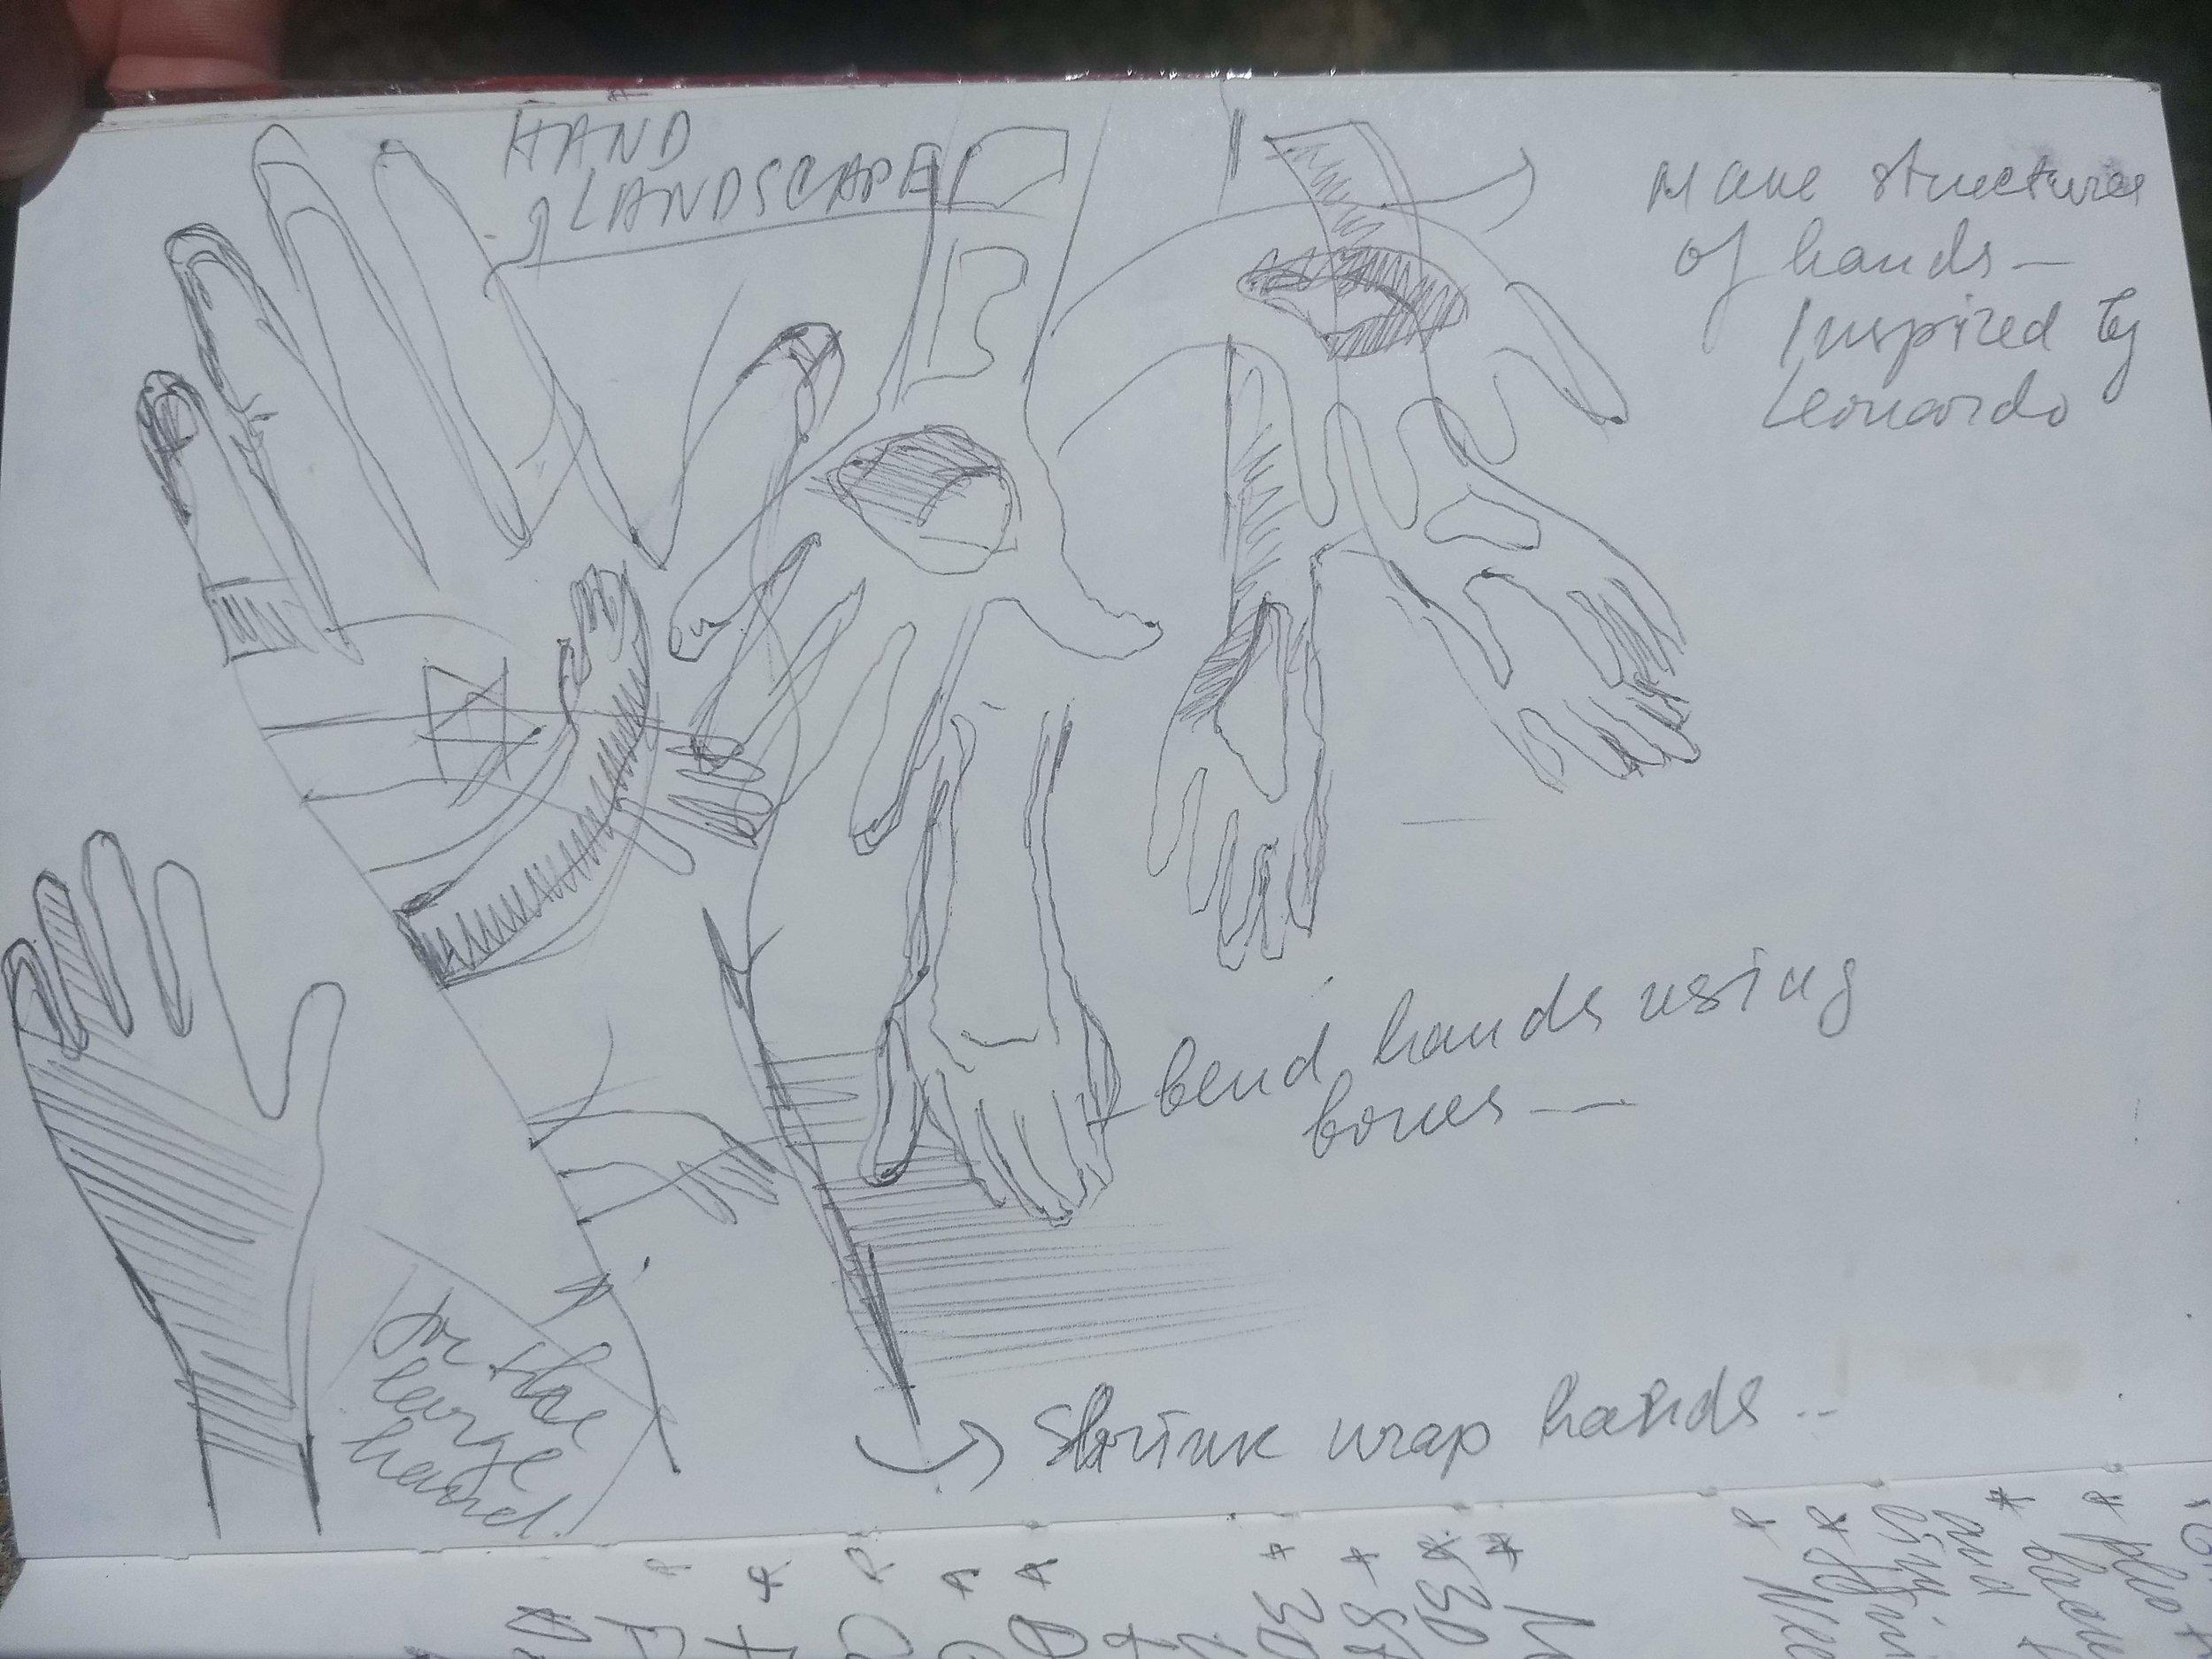 hands-tesseract-sketch-mirena-rhee.jpg